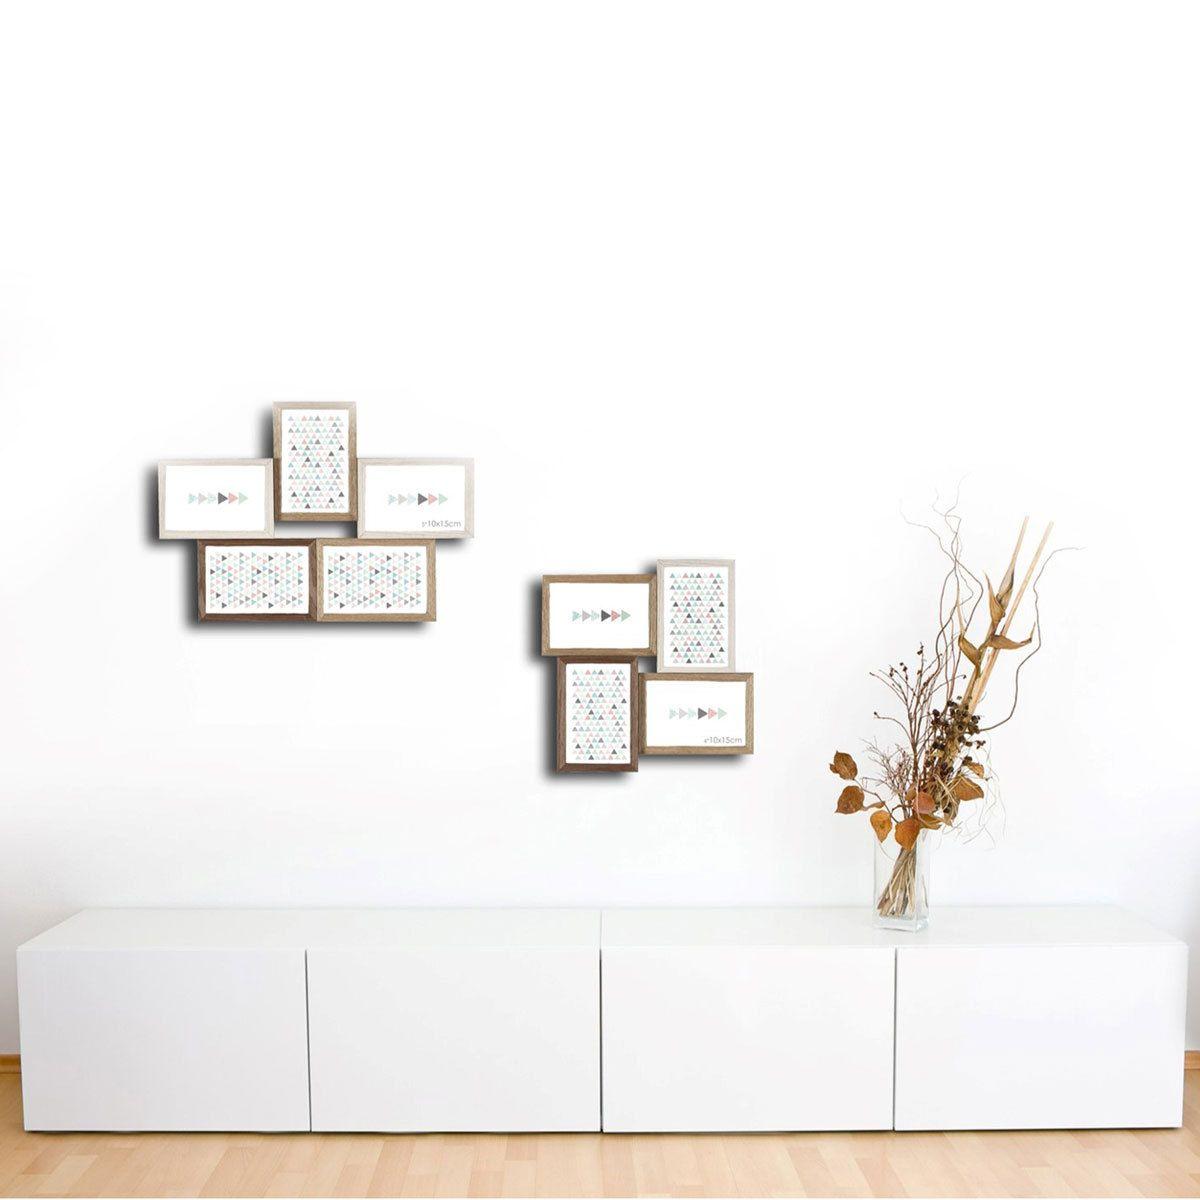 cadre photo cadre photo multivues scandi scandinave d co scandinave nordique. Black Bedroom Furniture Sets. Home Design Ideas